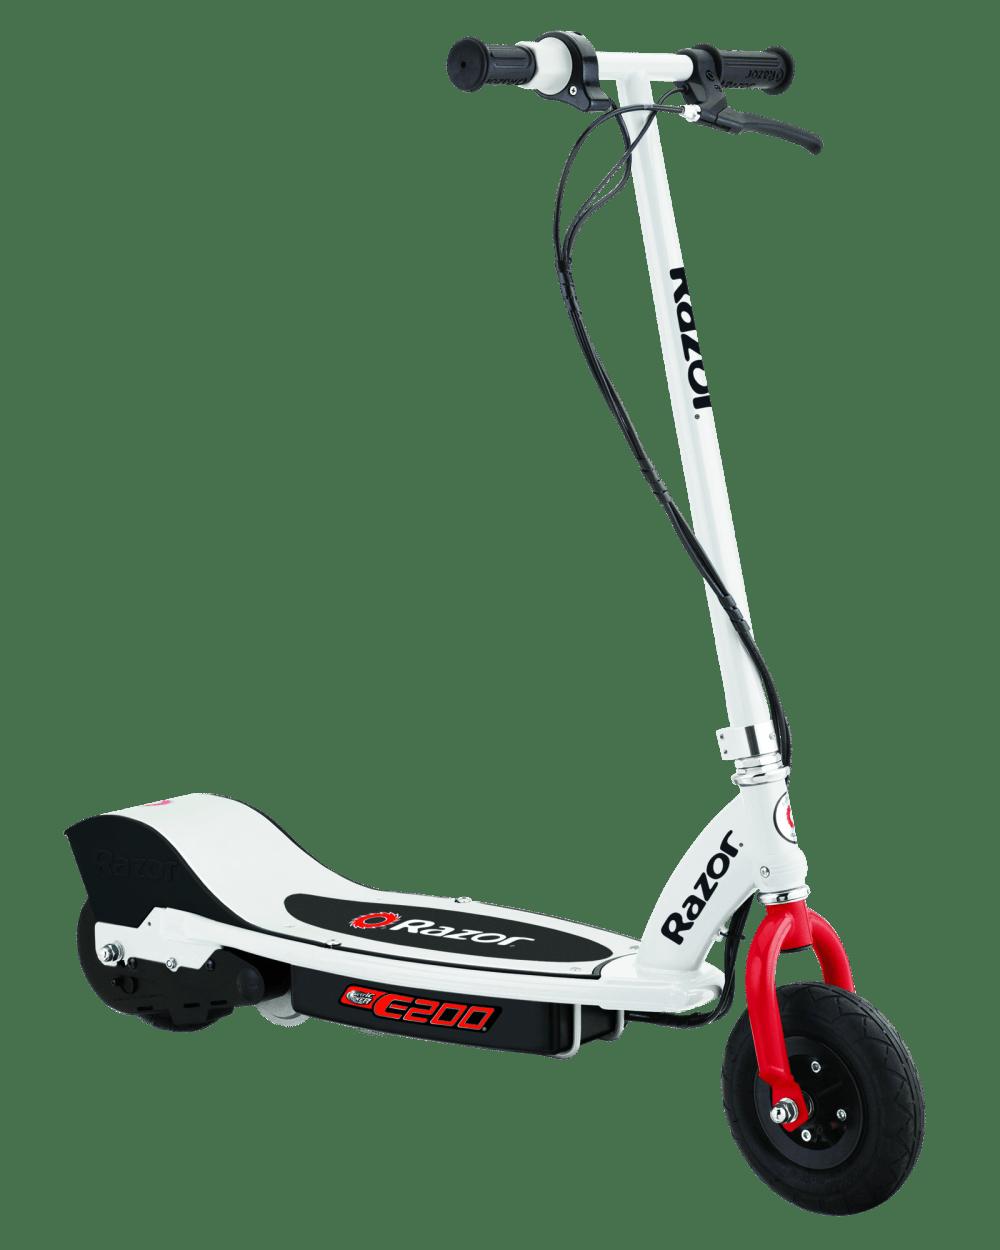 medium resolution of e200 electric scooter razor razor e200 battery wiring diagram